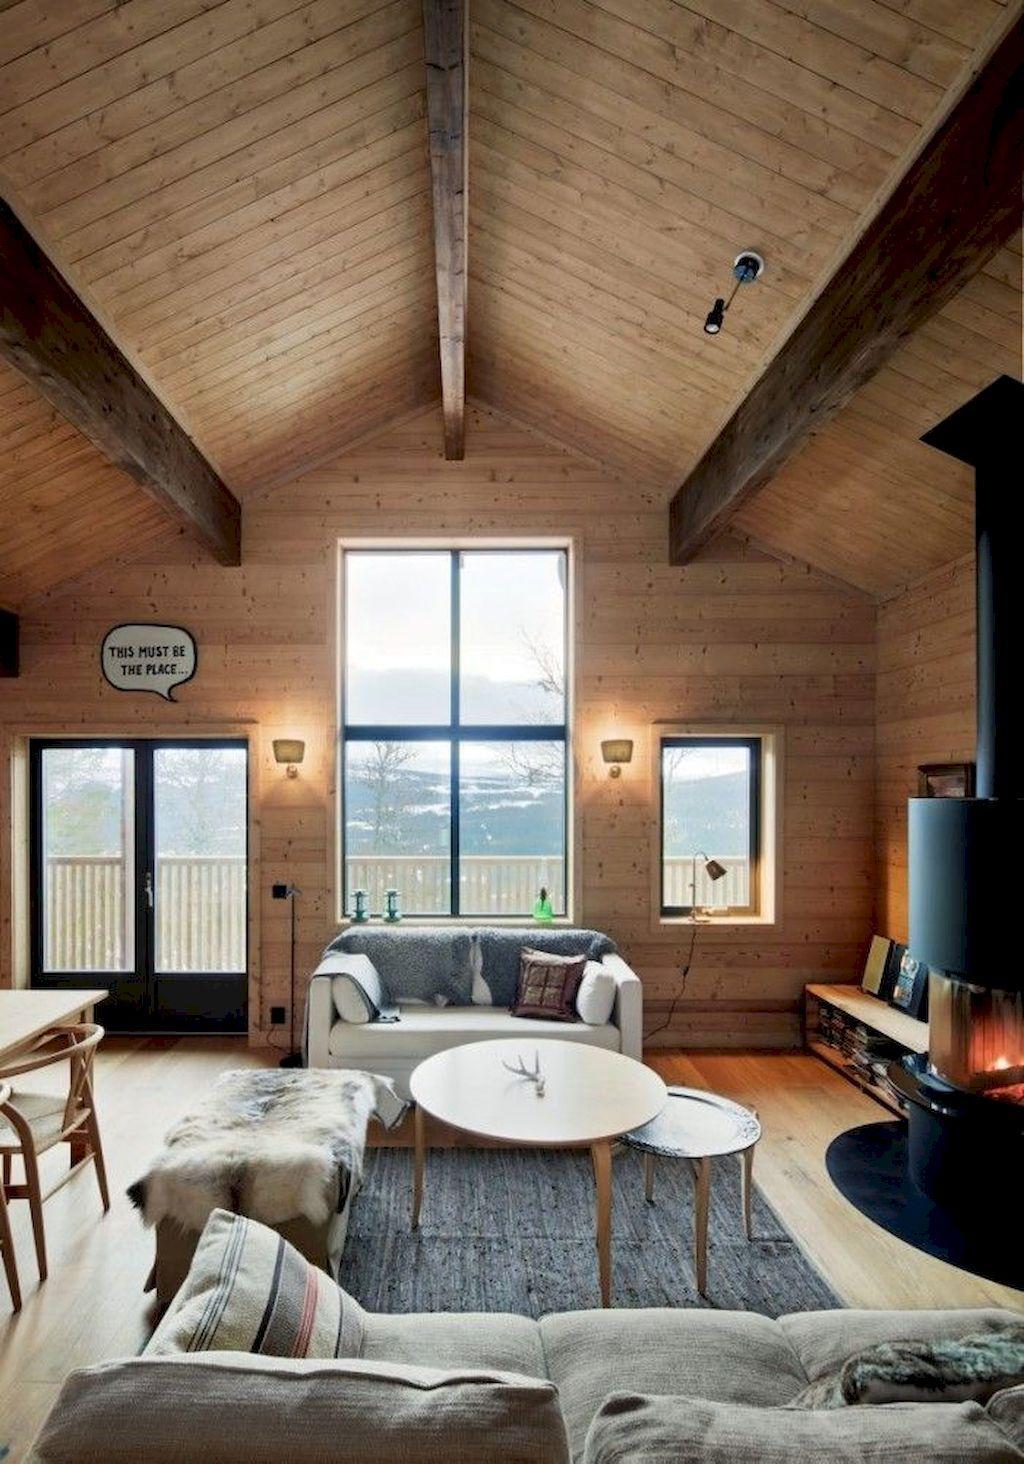 Beautiful Scandinavian Interiors For Your Home Cabin Interior Design Traditional Interior Design Scandinavian Interior